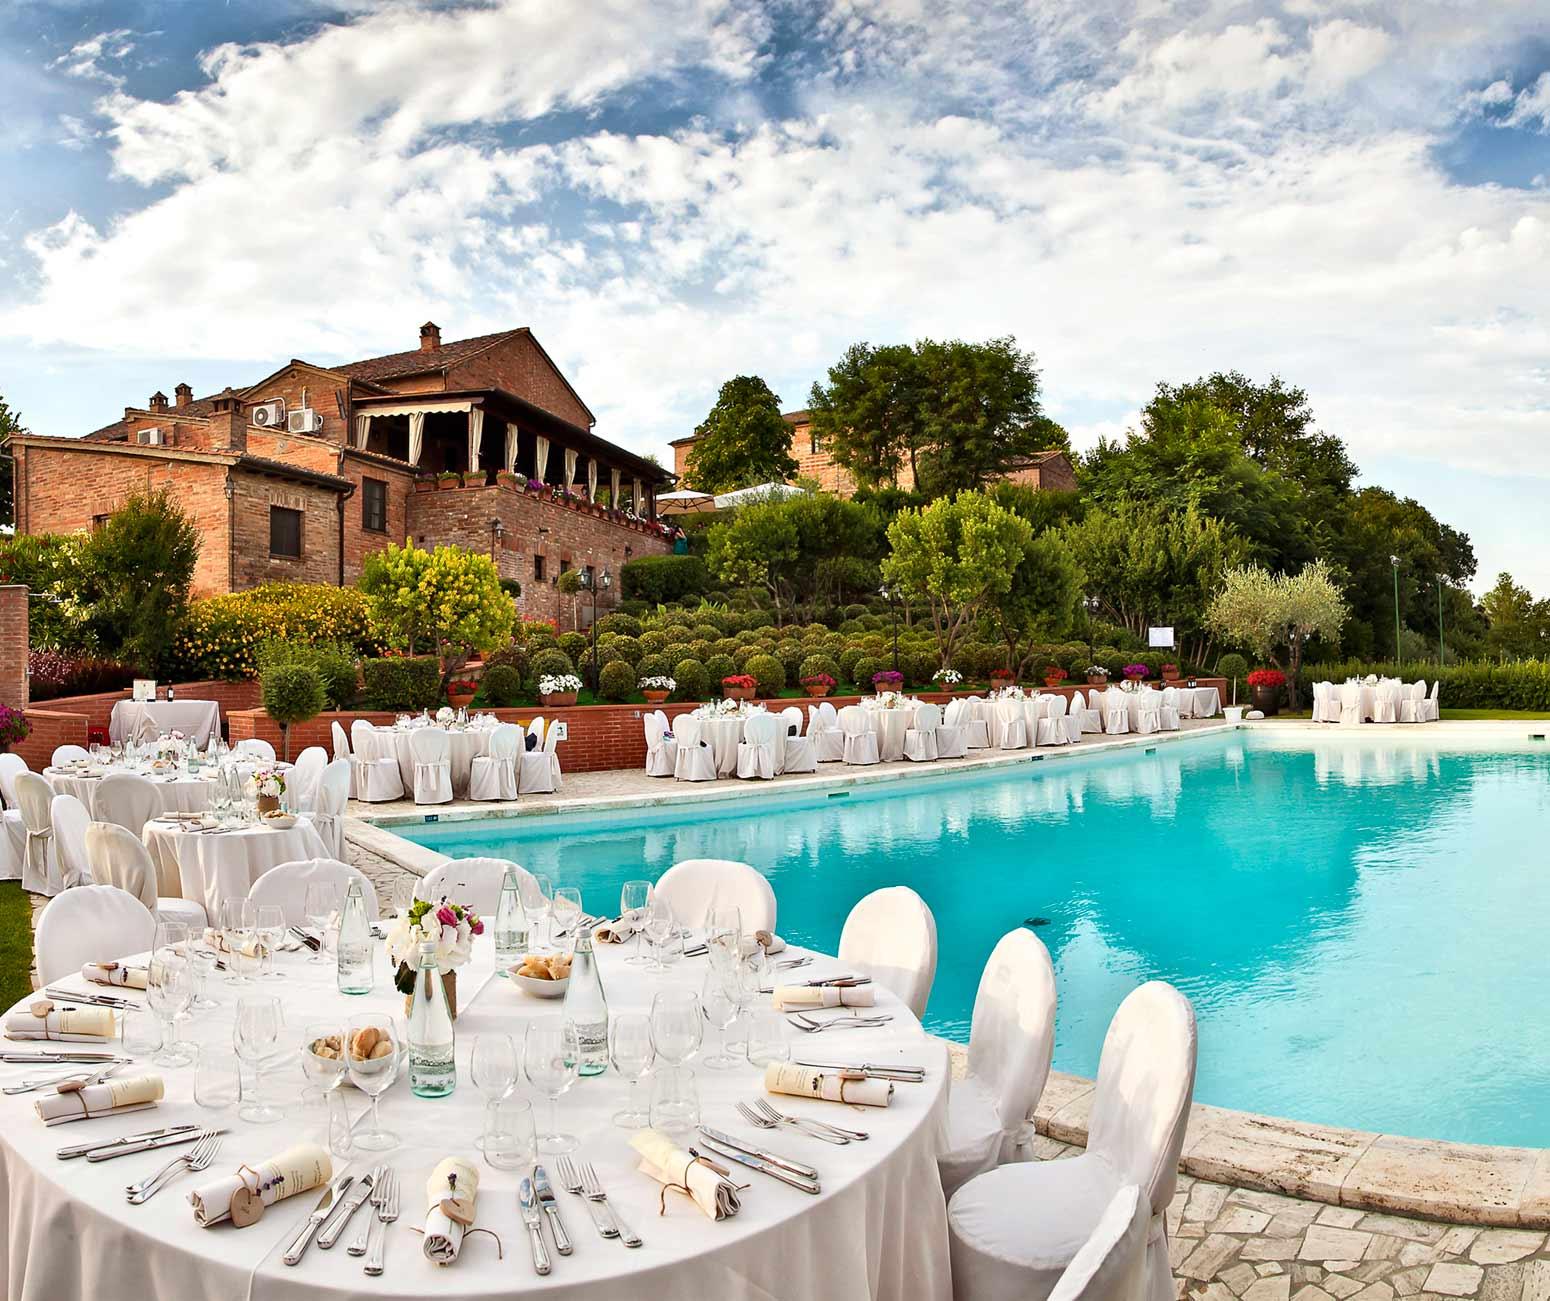 Ristorante Matrimonio Toscana : Ristorante matrimonio montepulciano borgo tre rose